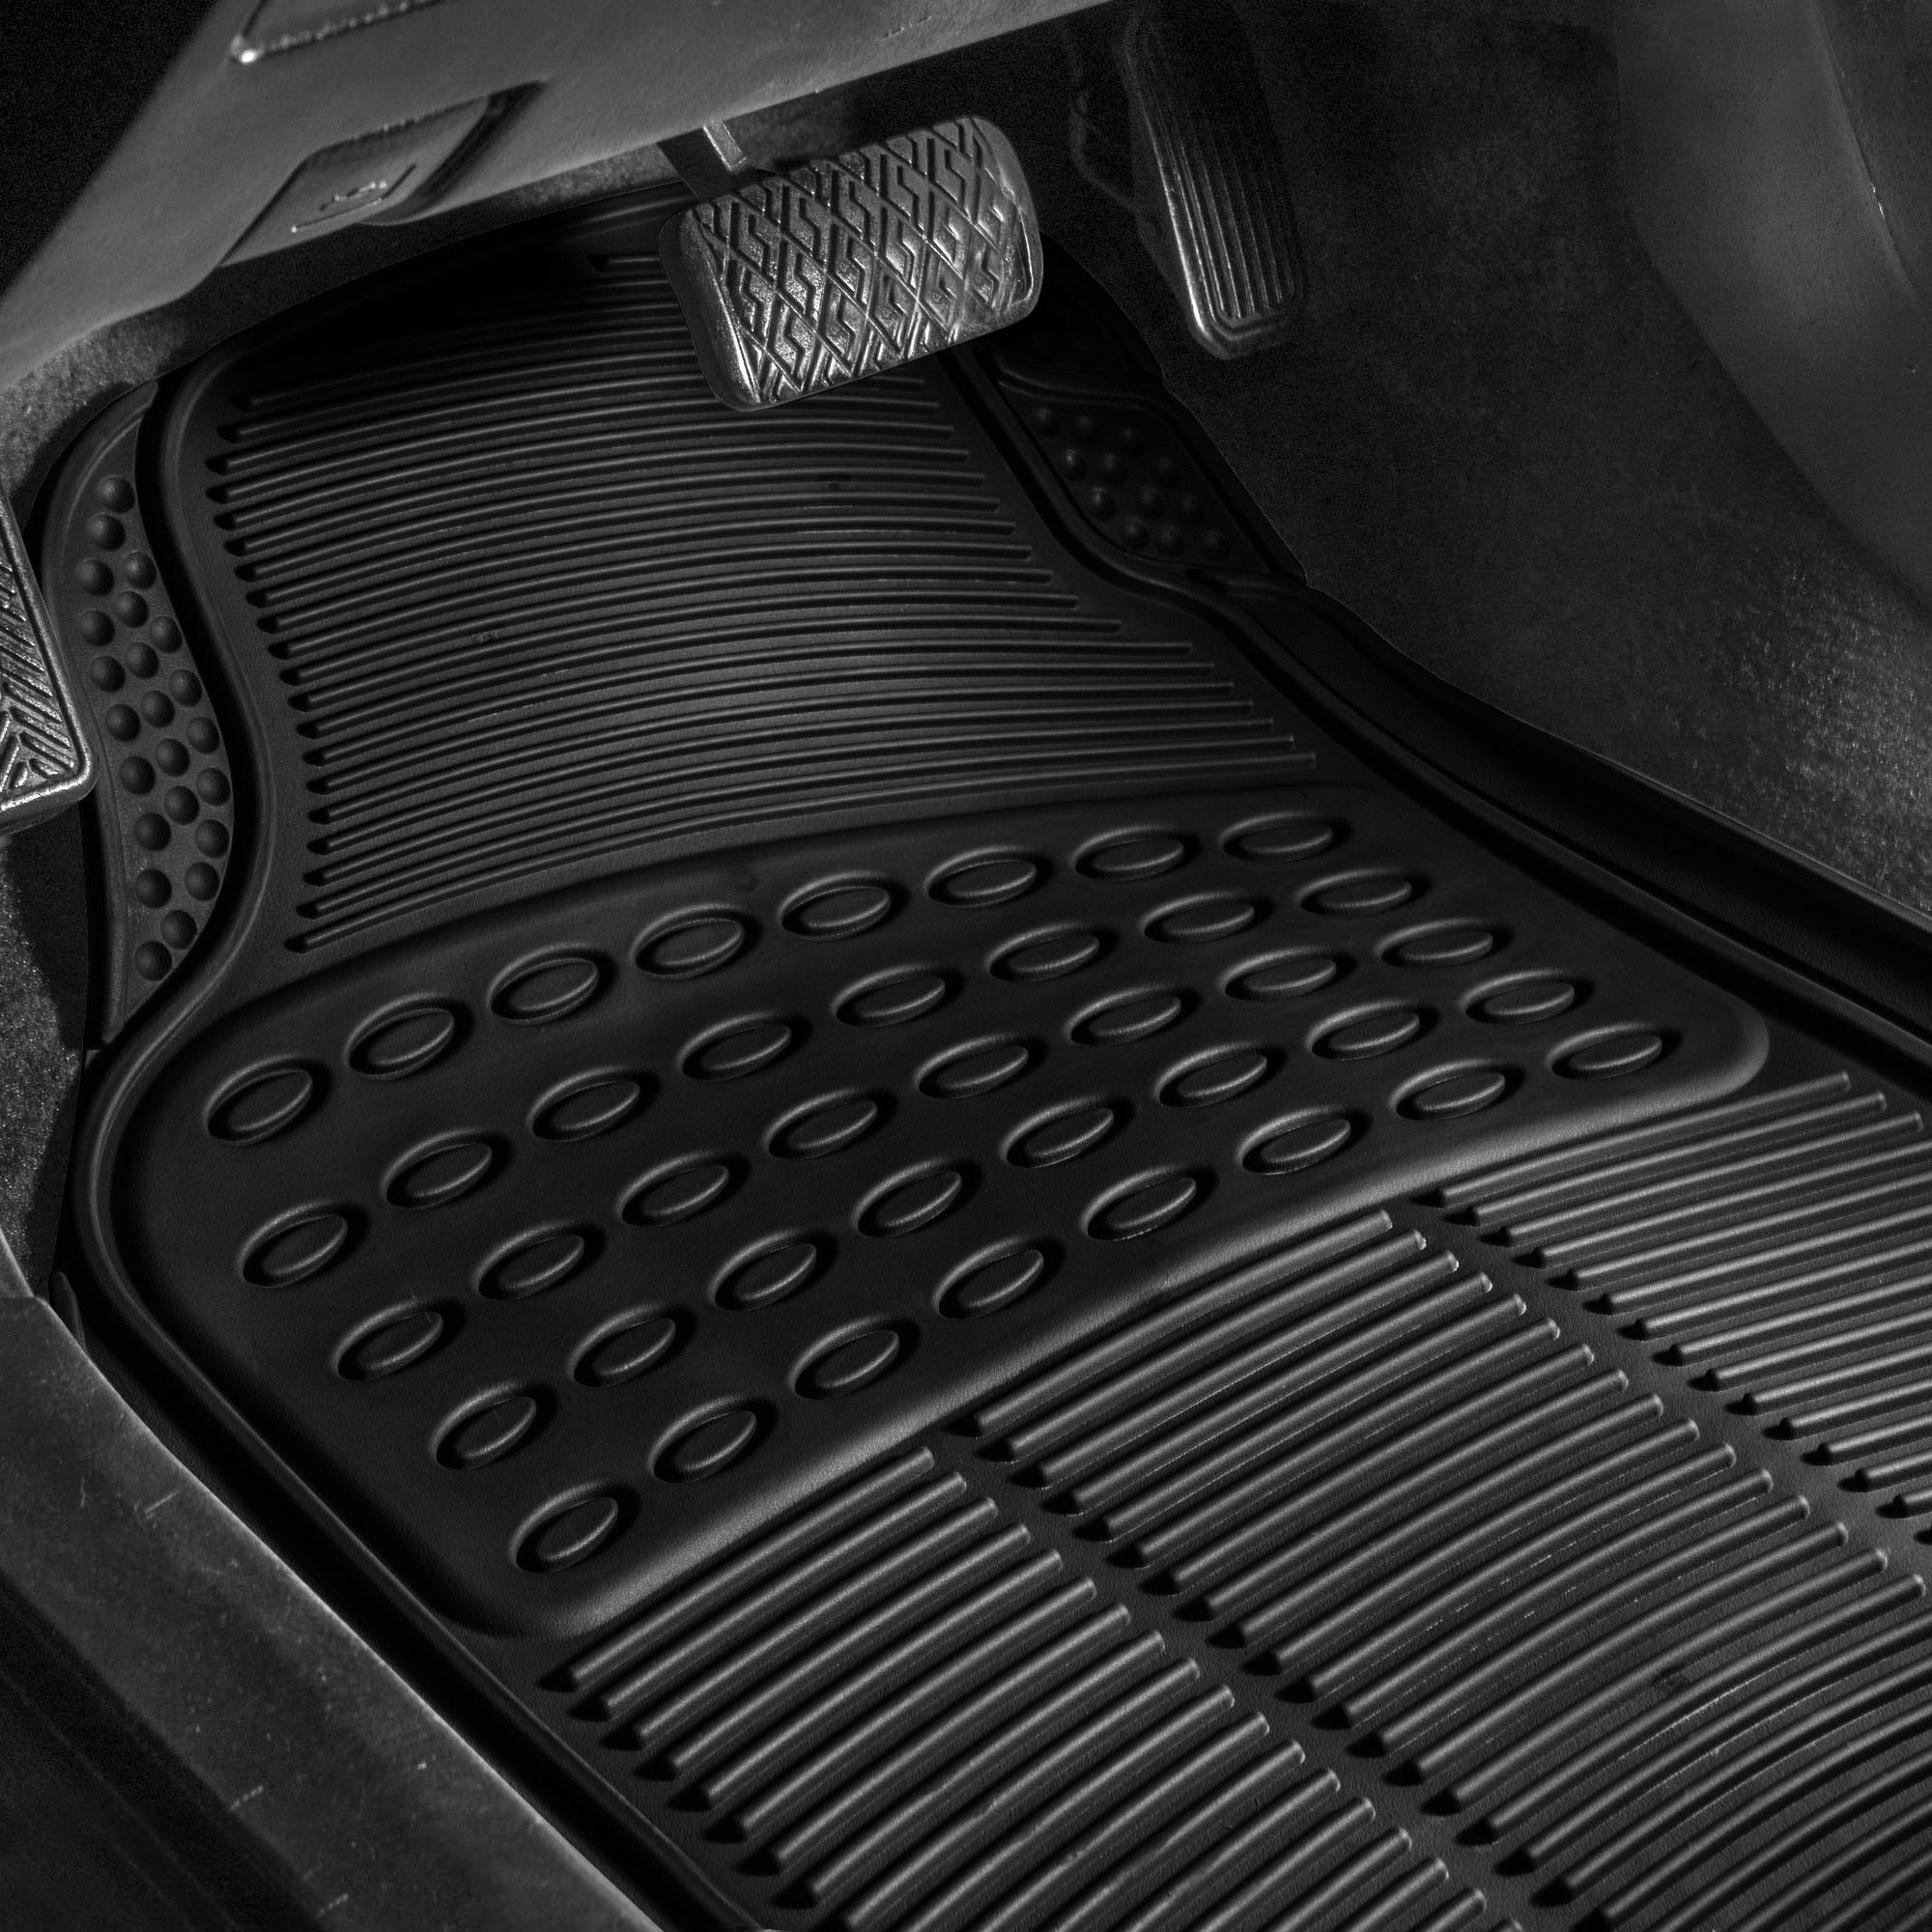 3pc-Floor-Mats-for-Auto-Car-SUV-Van-Heavy-Duty-3-Colors-w-Free-Gift thumbnail 12